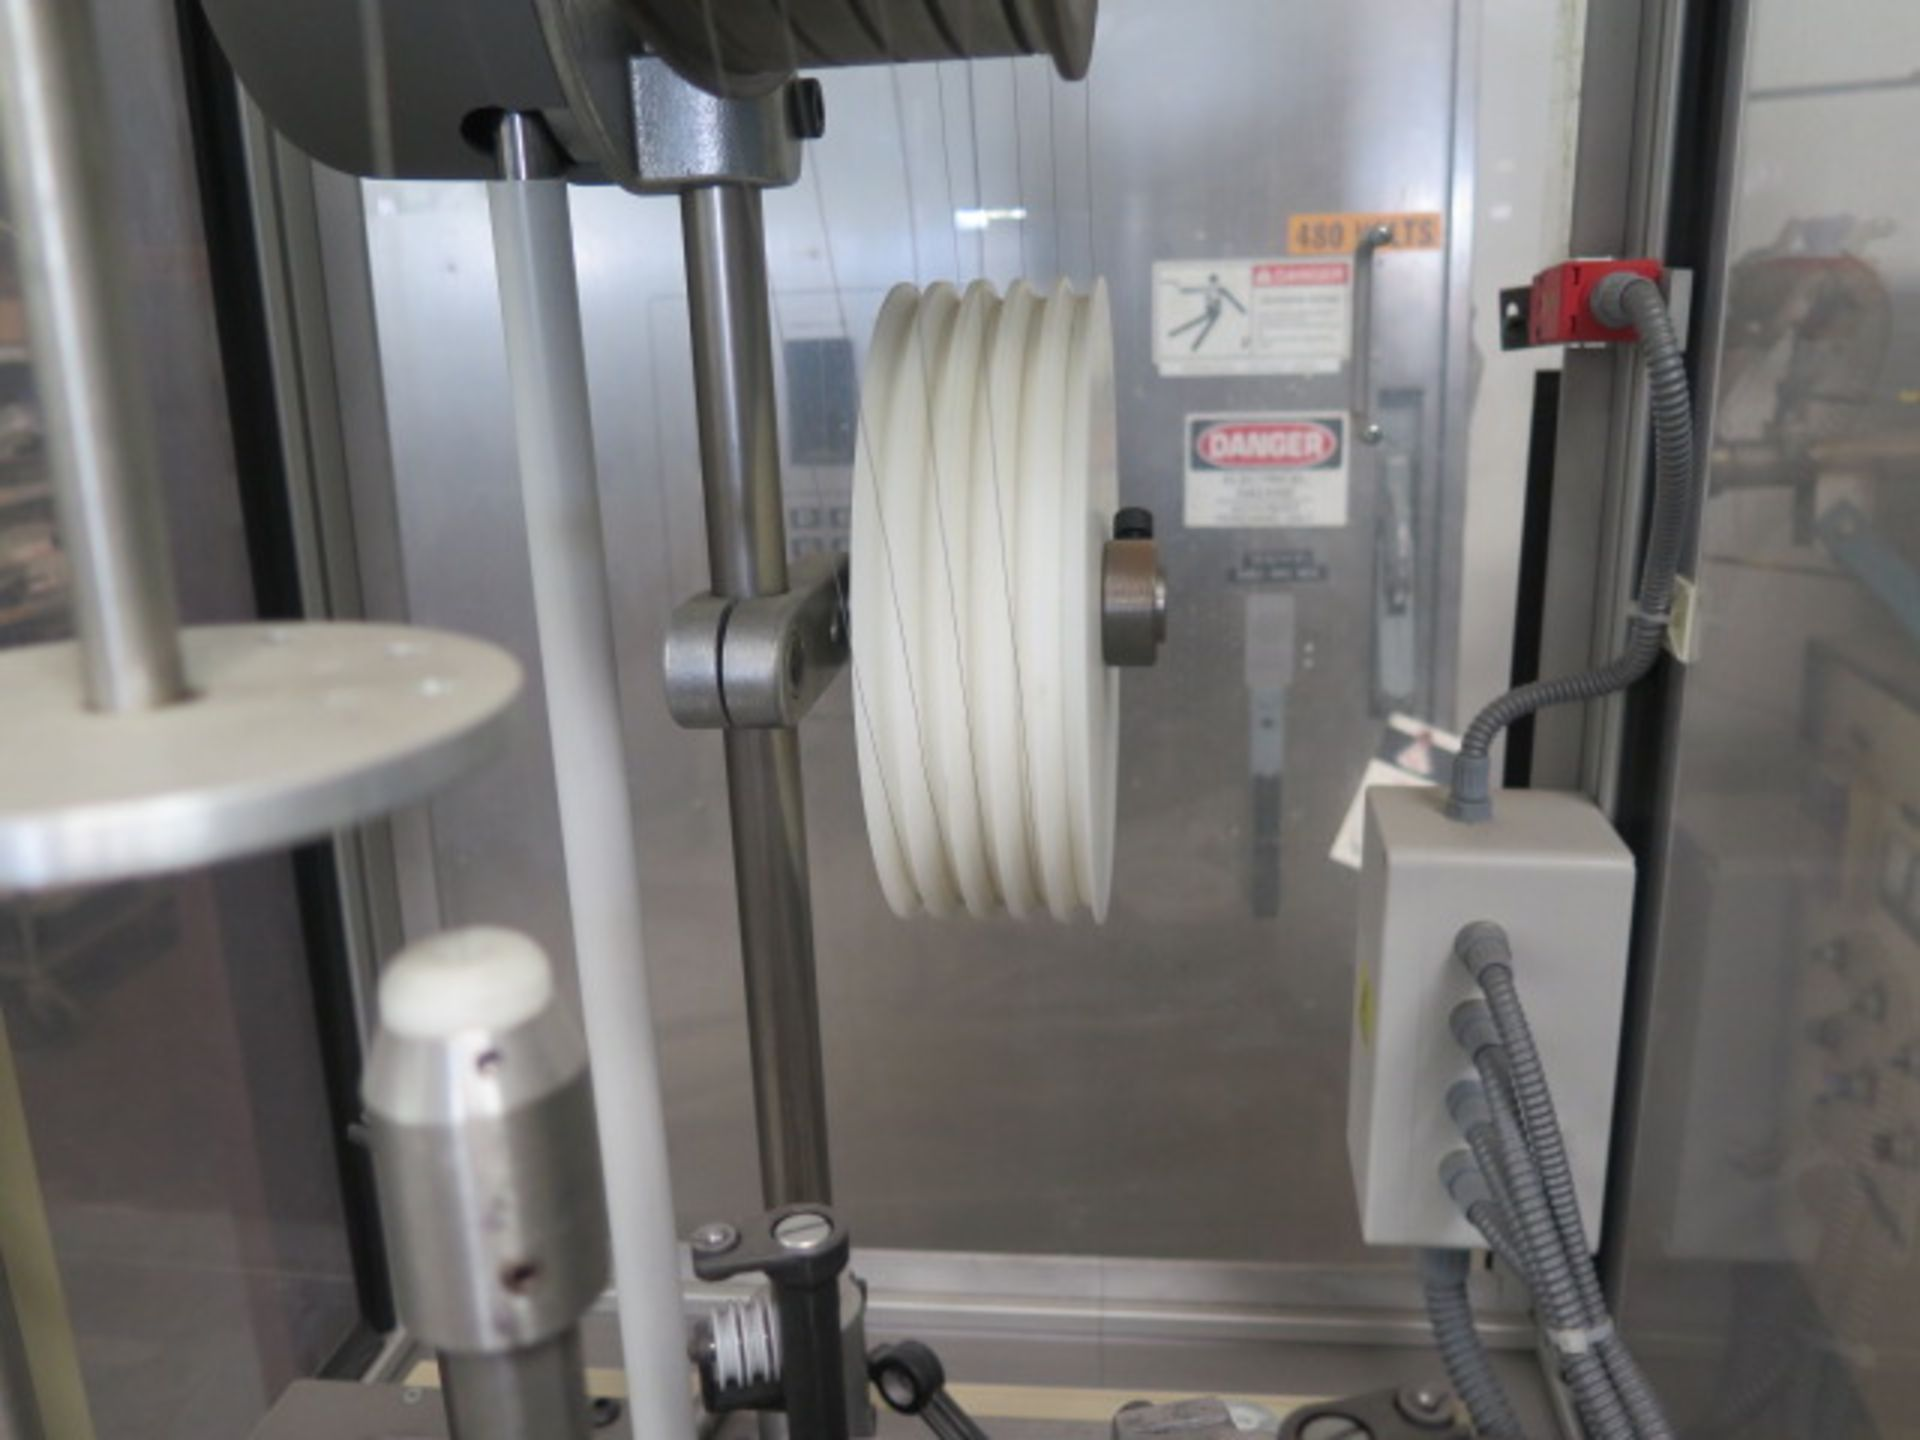 Lot 133 - 2004 Steeger type K80/16-72/98Wire Braiding Machine s/n 5647 (SOLD AS-IS - NO WARRANTY)